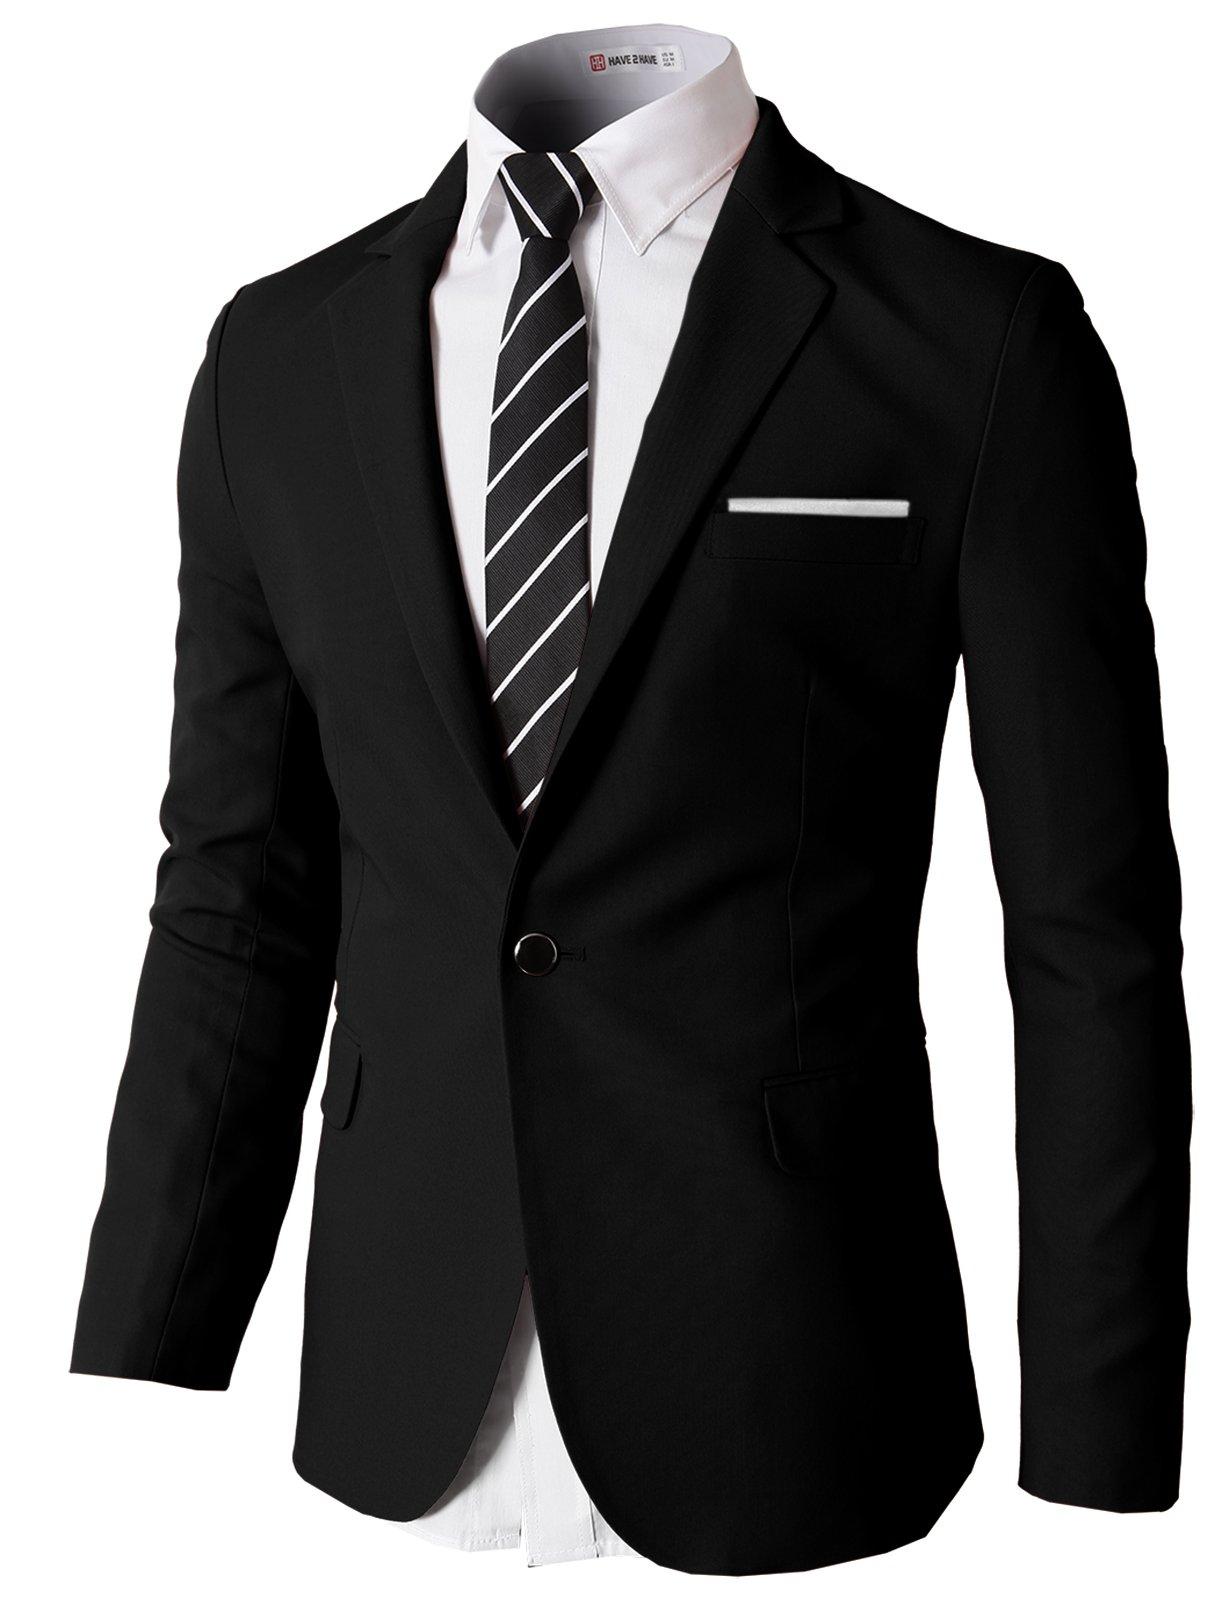 H2H Mens Slim Fit Single One Button Blazer Jackets with Pocketchief Trim BLACK US L/Asia XL (KMOBL046)